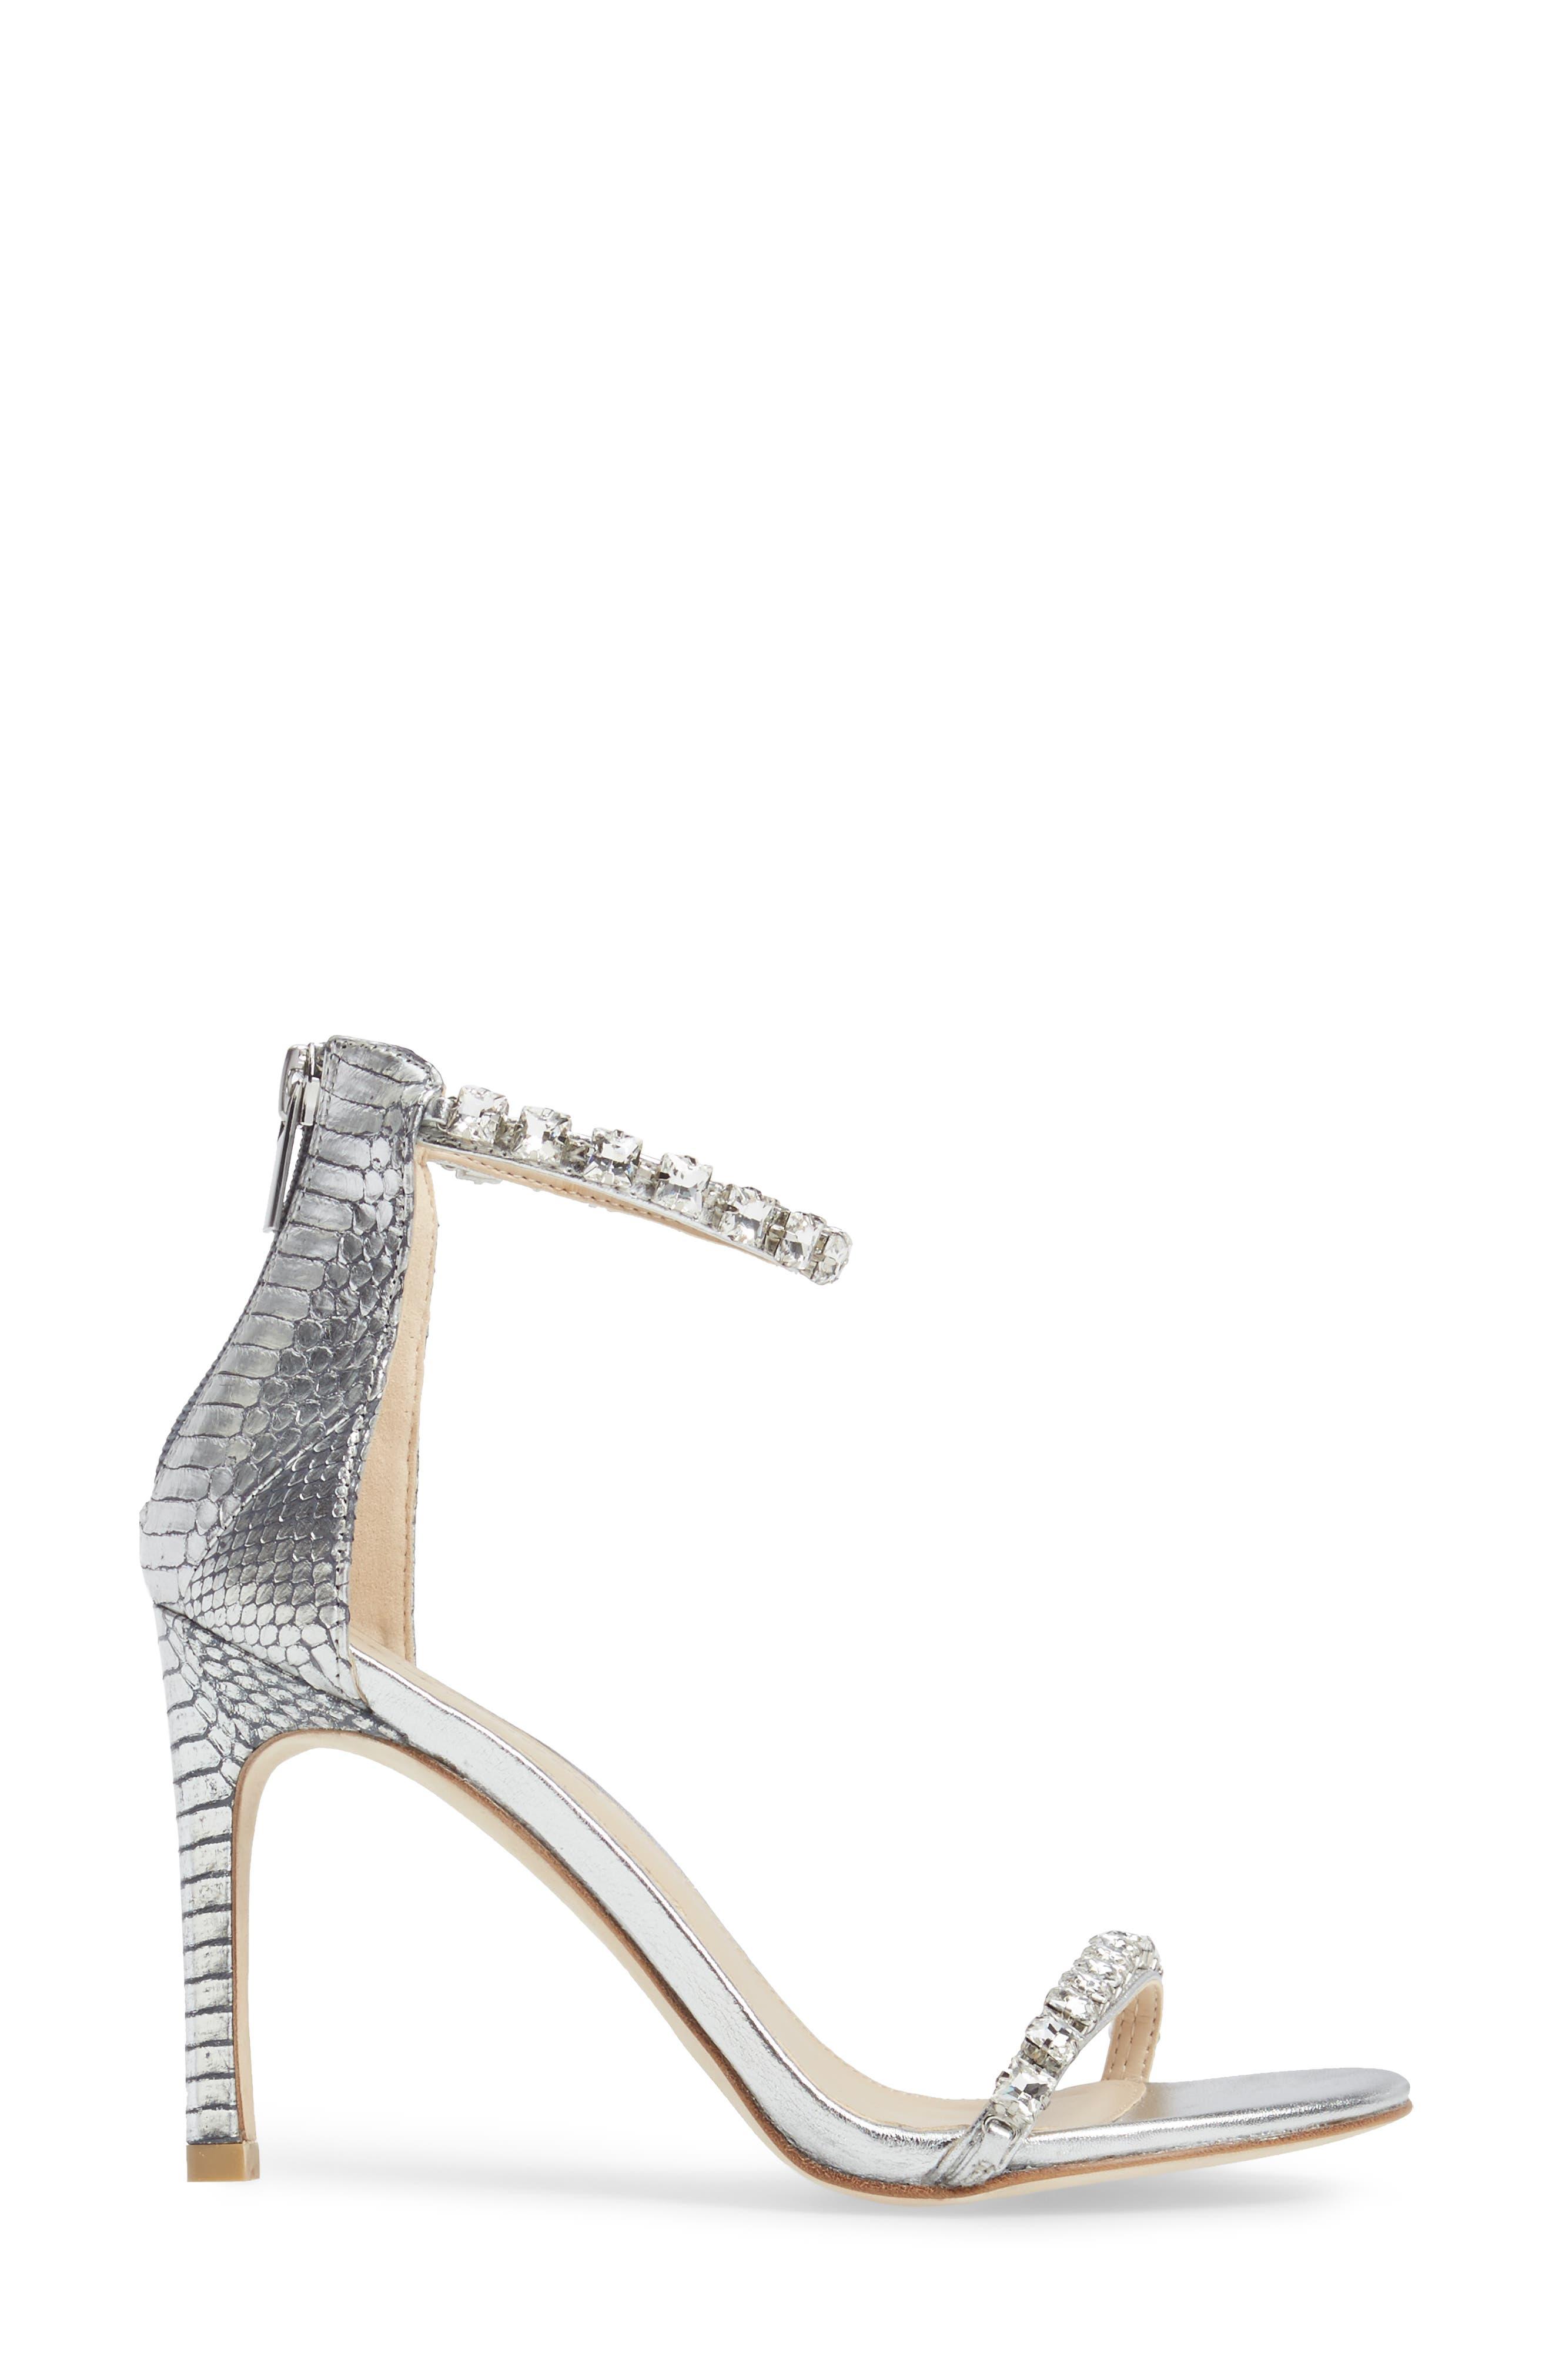 Alternate Image 3  - Pelle Moda Frisk Embellished Sandal (Women)